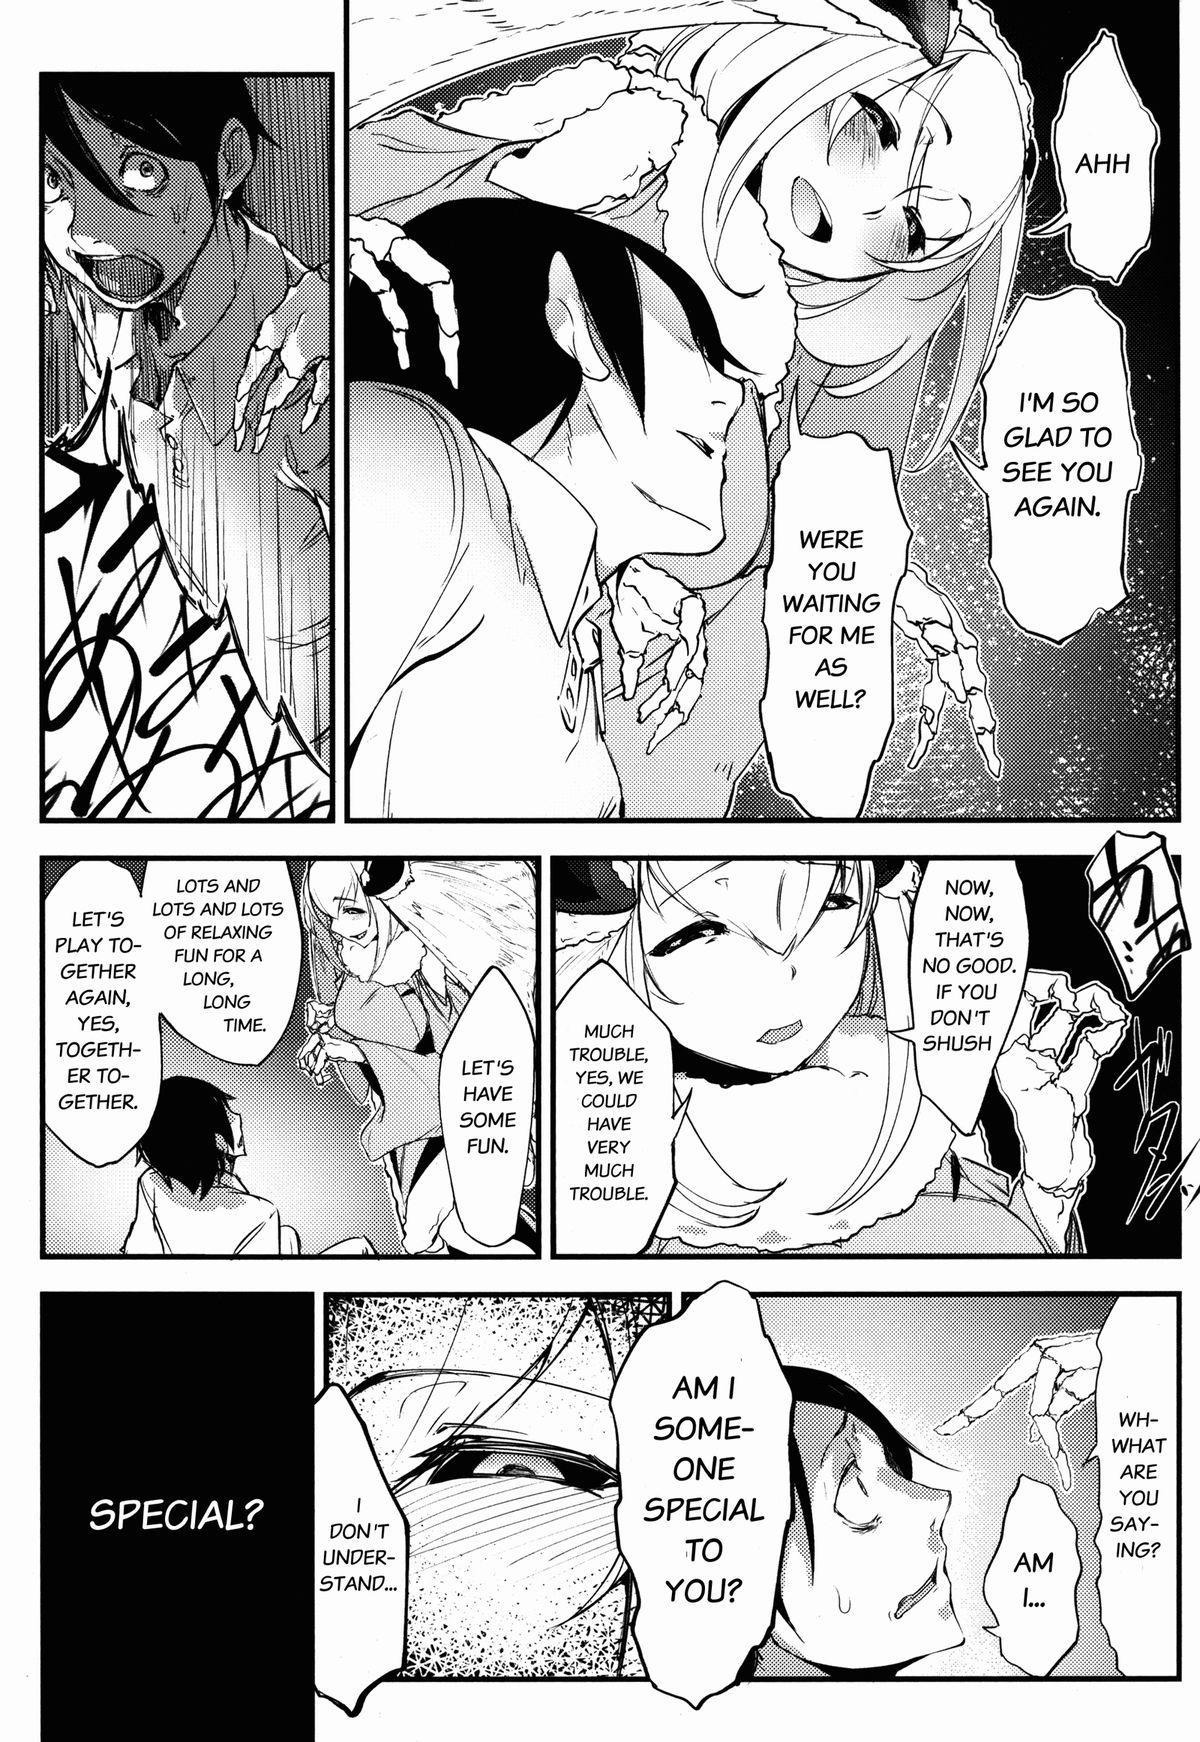 (COMIC1☆9) [Sakekan Memorial (SOLOPIPB)] Shiragasane -Tamoto-   Layers of White 2 [English] [rampantserenity] 9